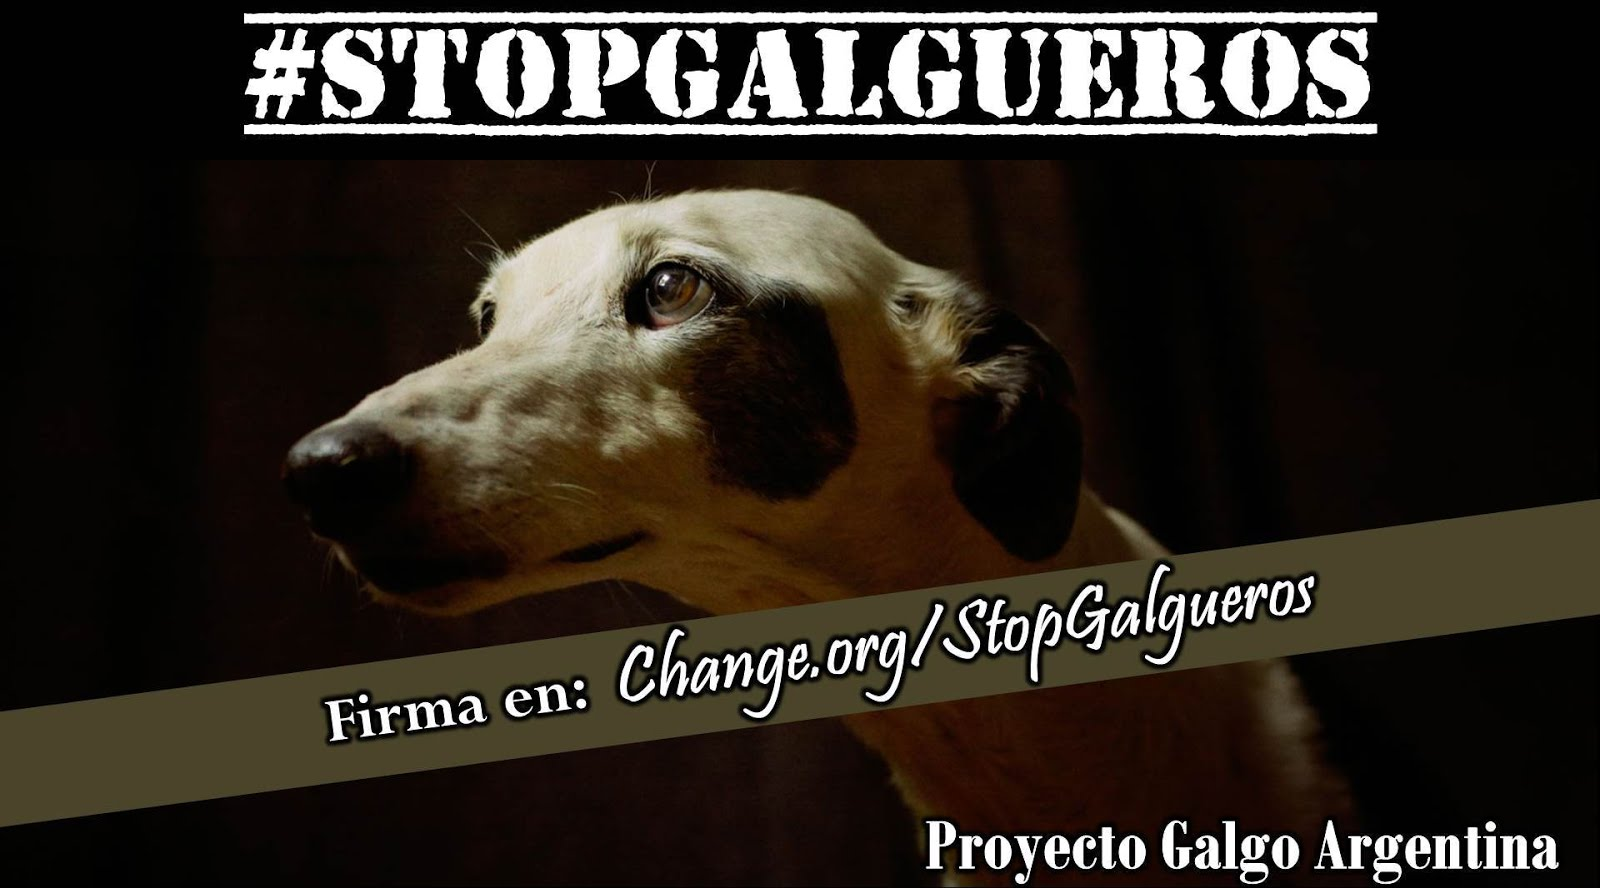 #STOPGALGUEROS